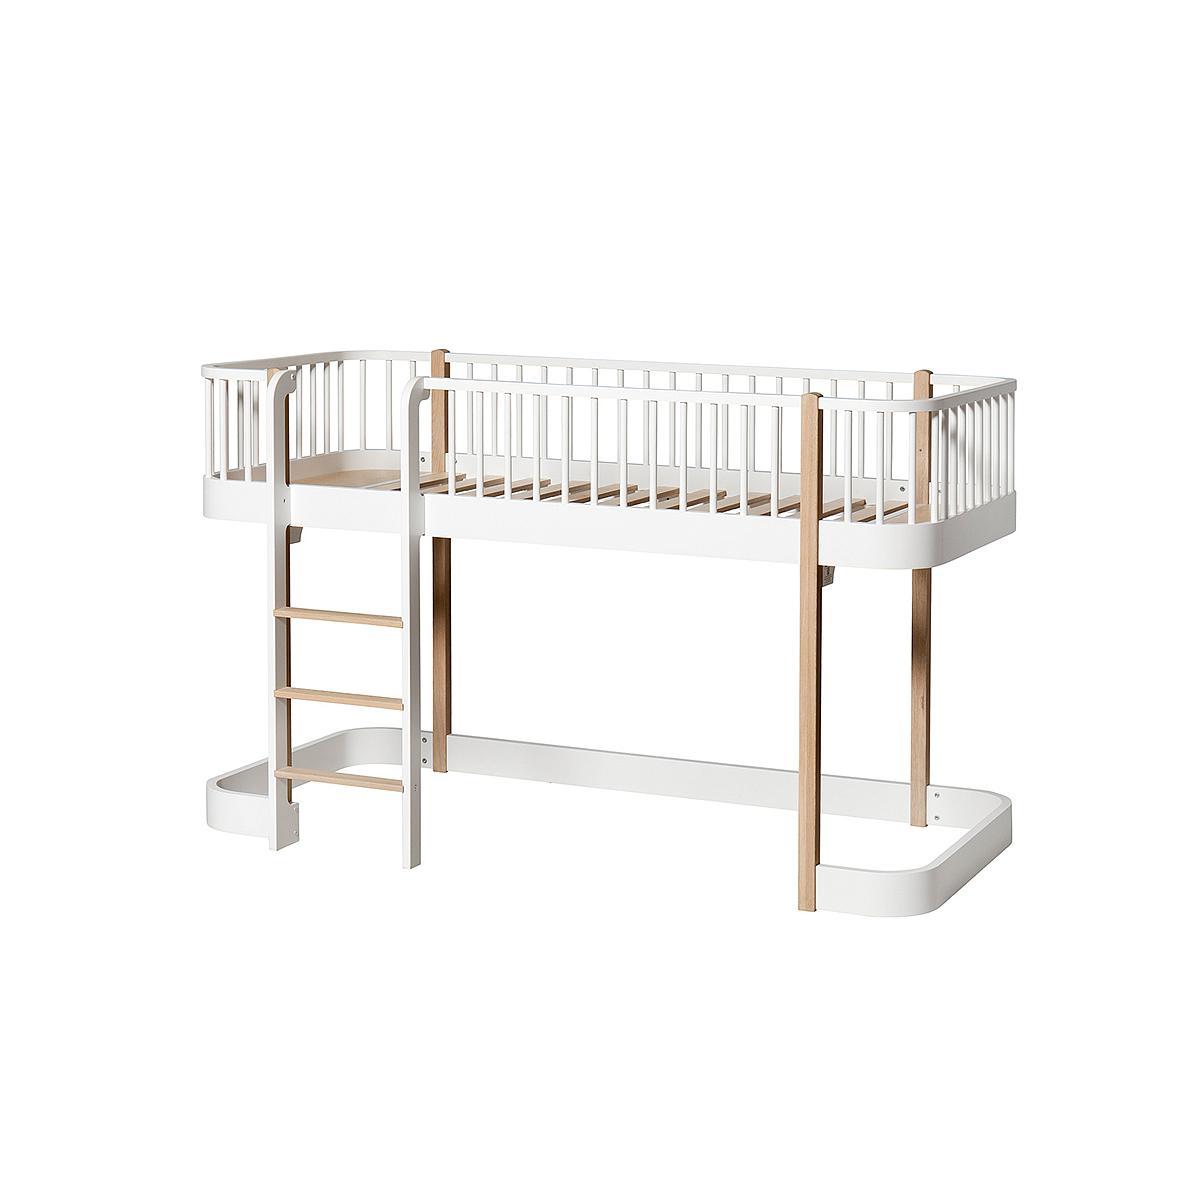 Lit évolutif mi hauteur 90x200cm WOOD ORIGINAL Oliver Furniture blanc-chêne